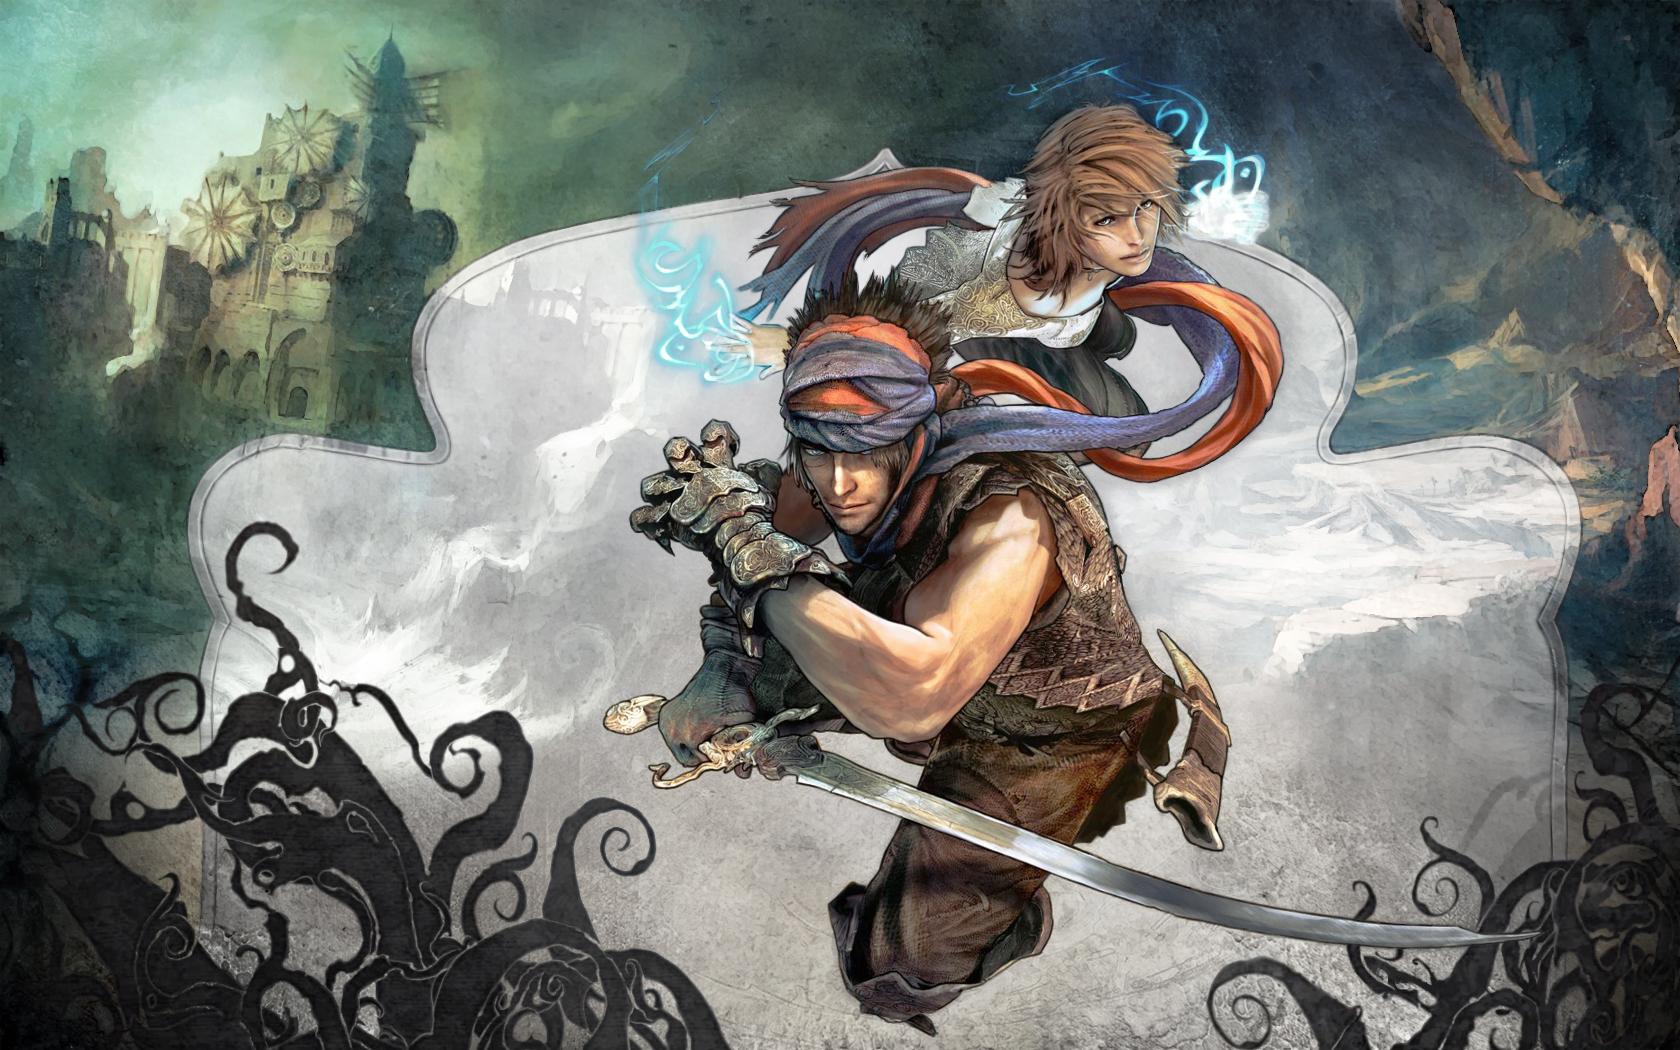 Dibujos de guerreros - 1680x1050